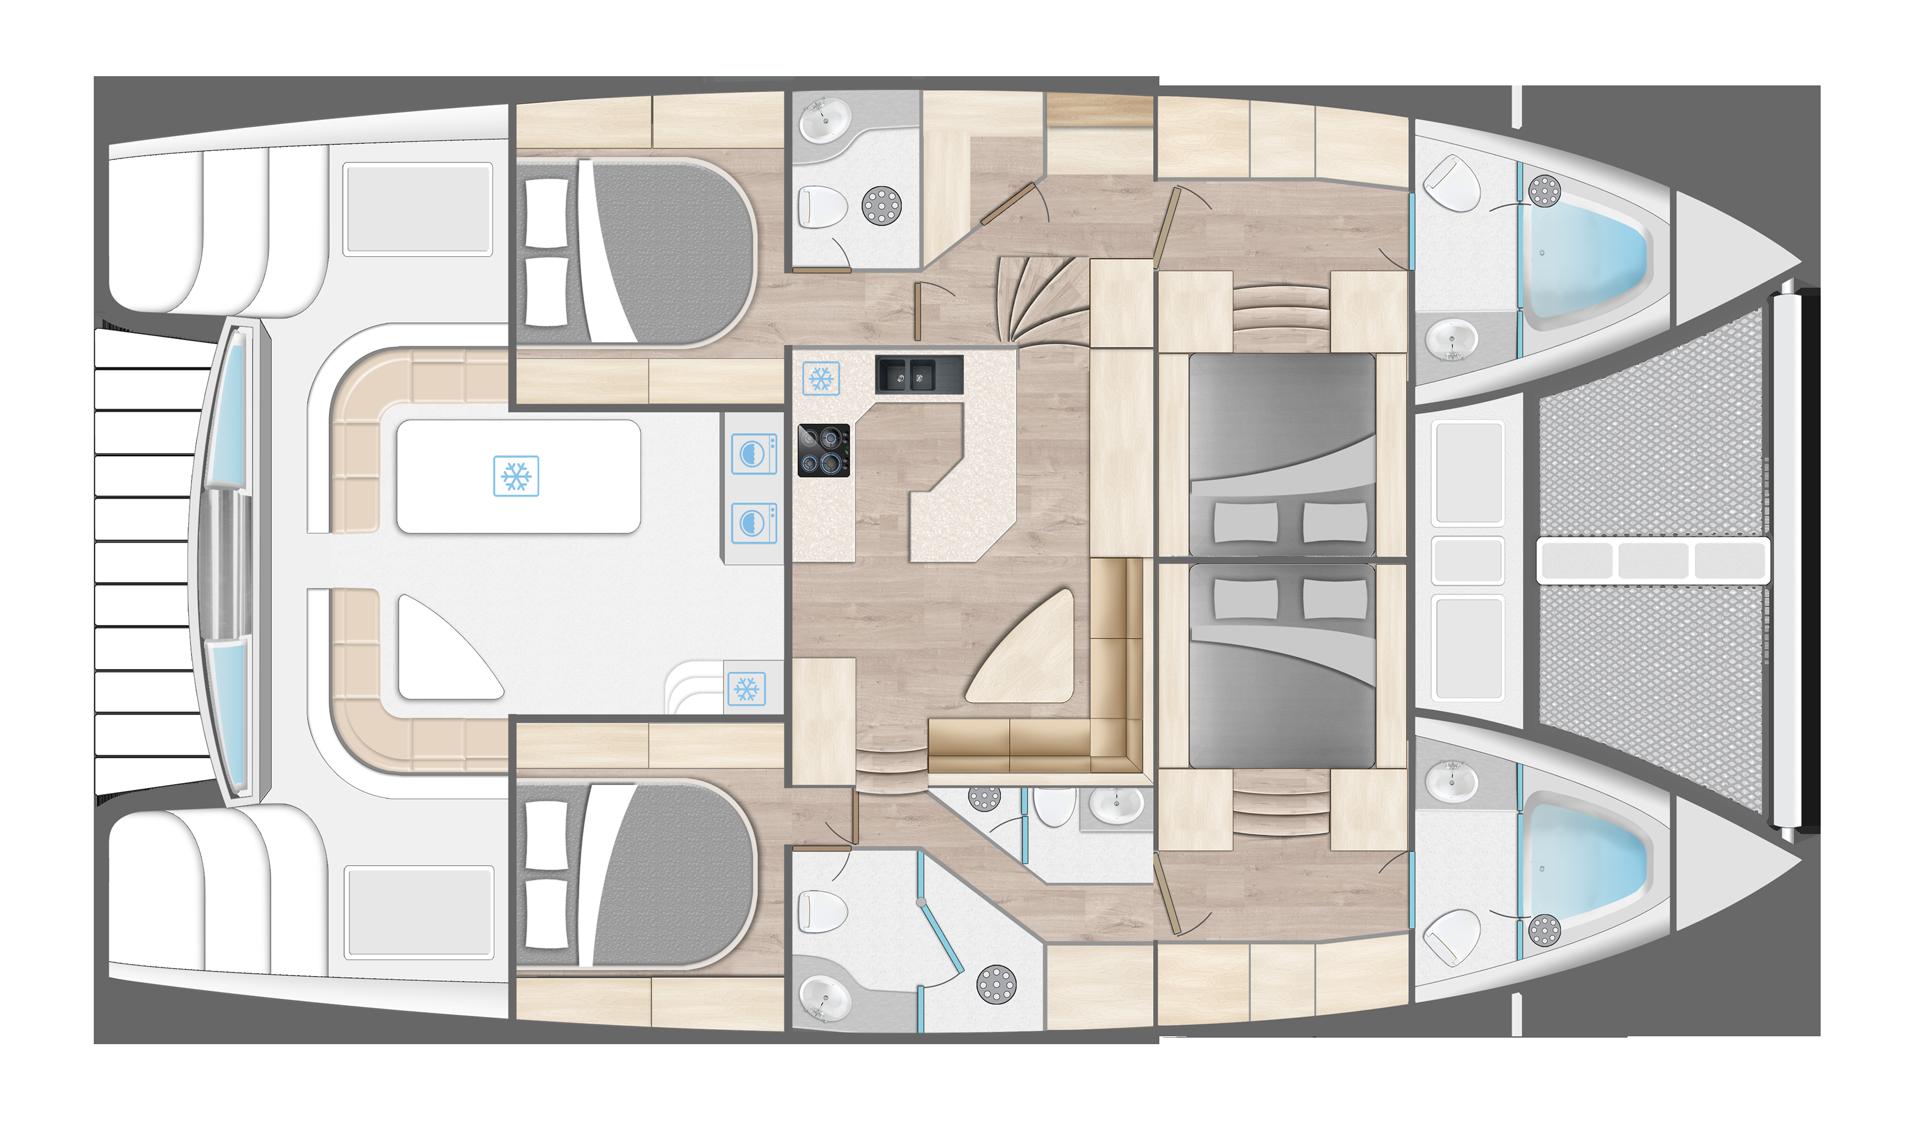 Royal Cape Catamarans, Majestic 530 Yacht cabin layout